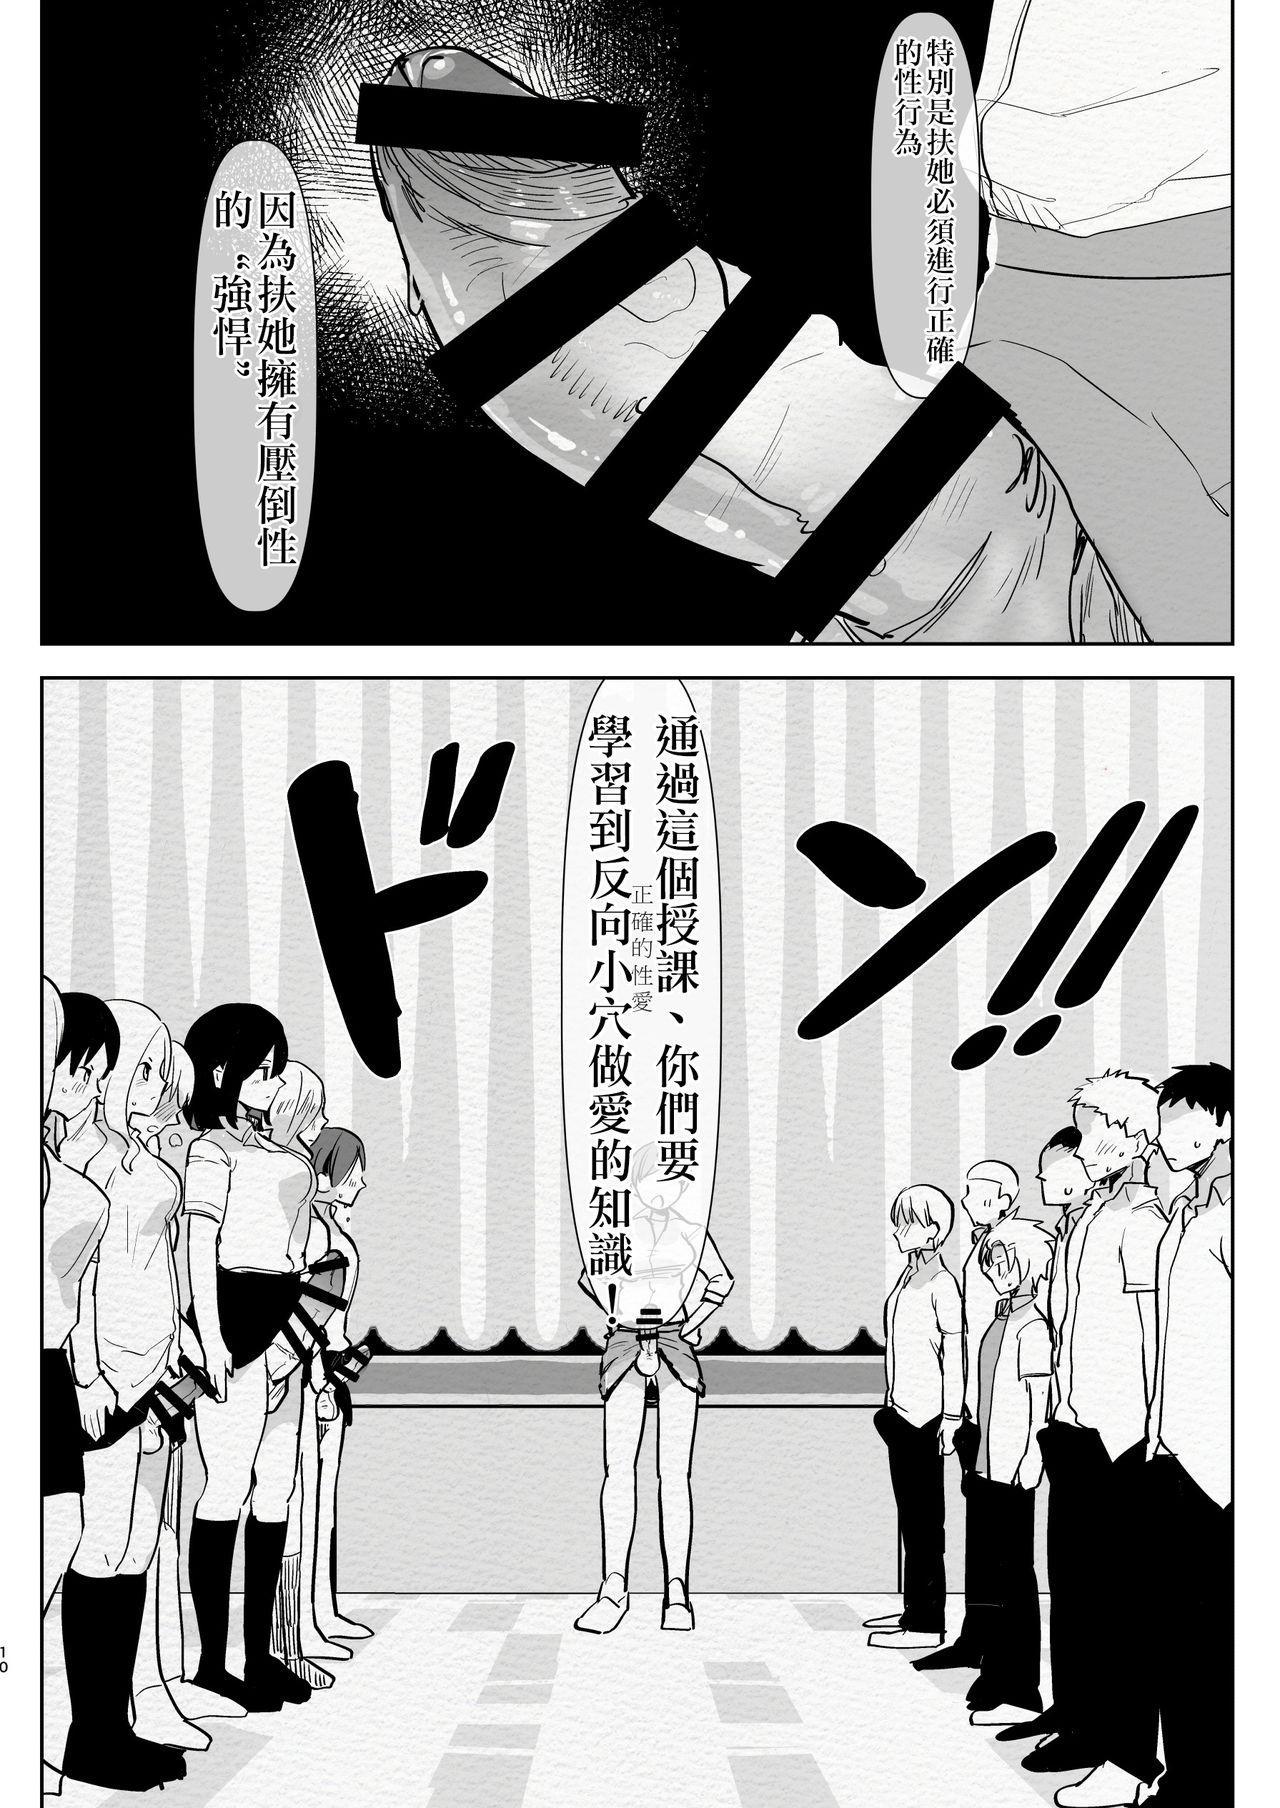 Futanari Osananajimi to Ore to Hajimete no Gyaku Anal Kagai Jugyou 丨扶她青梅竹馬和我第一次的反向小穴做愛課外授課 10